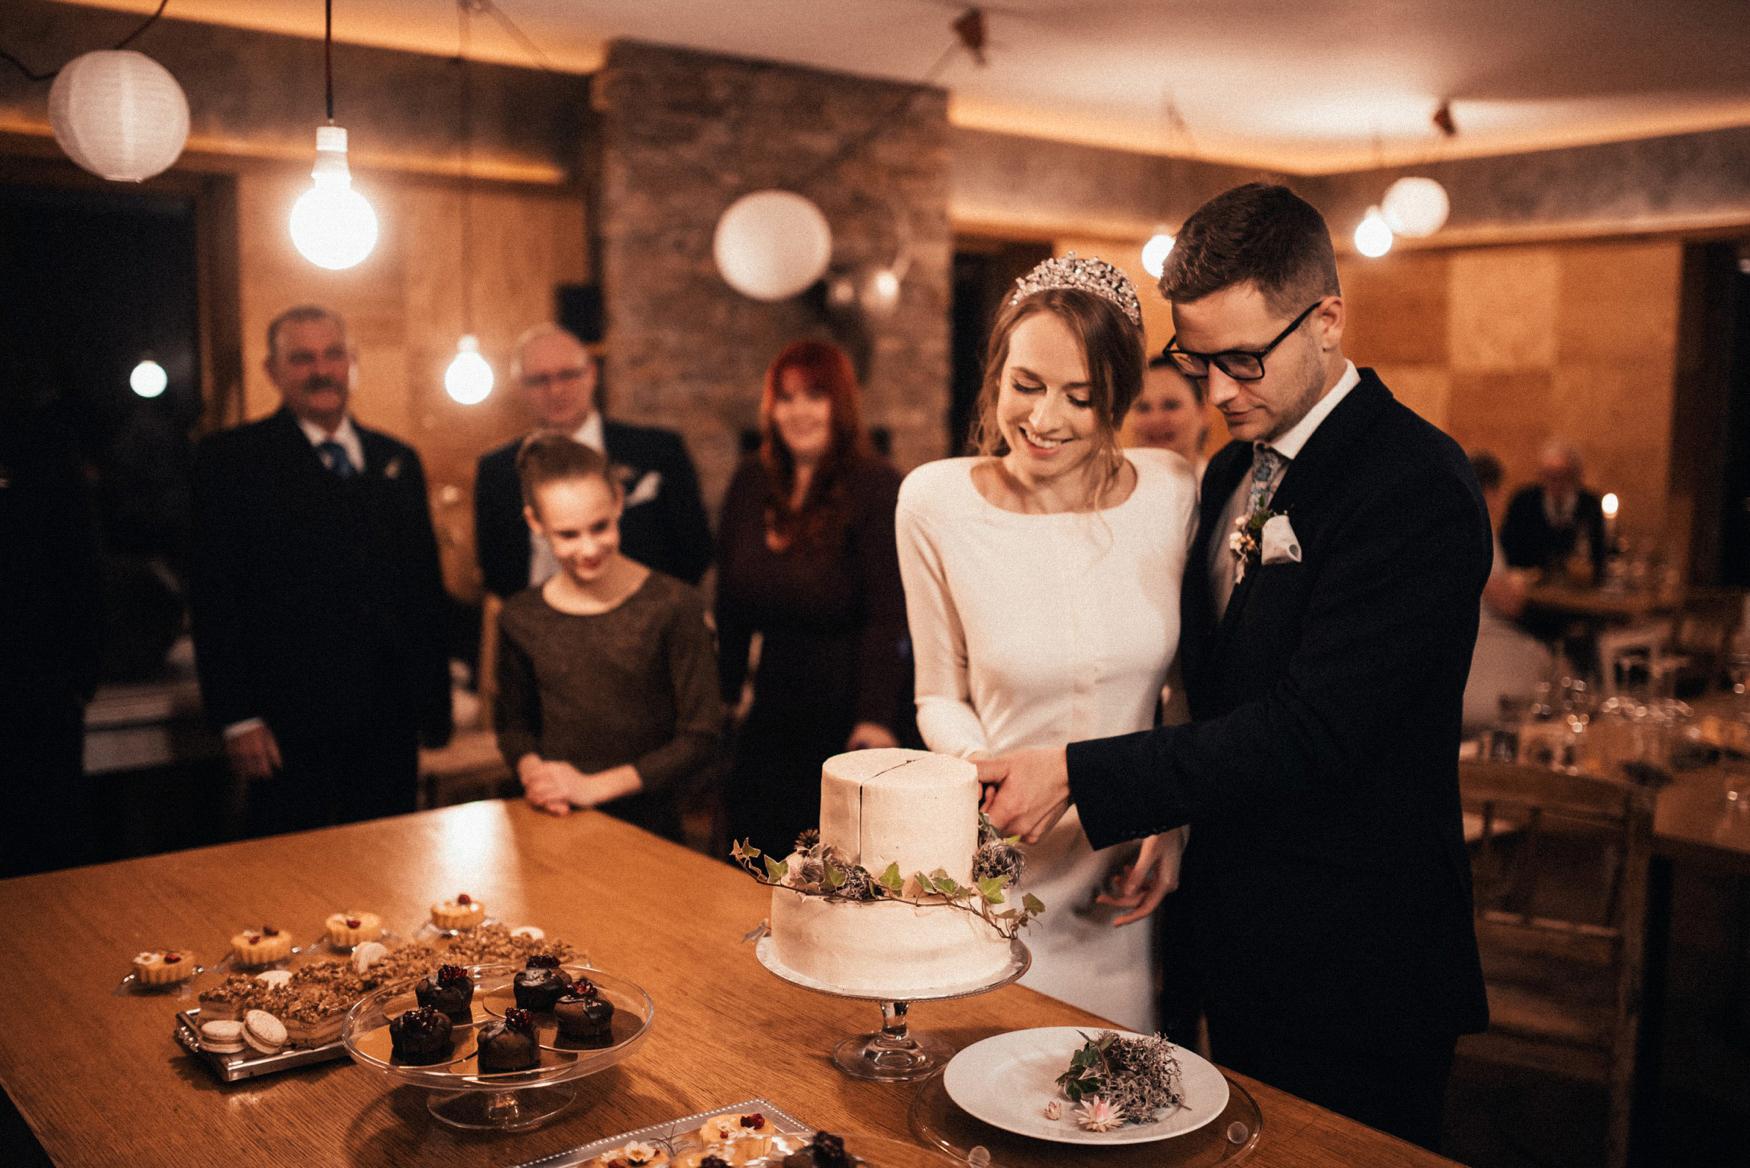 3 czech countryside rustic wedding - svatba zikmundov022.jpg